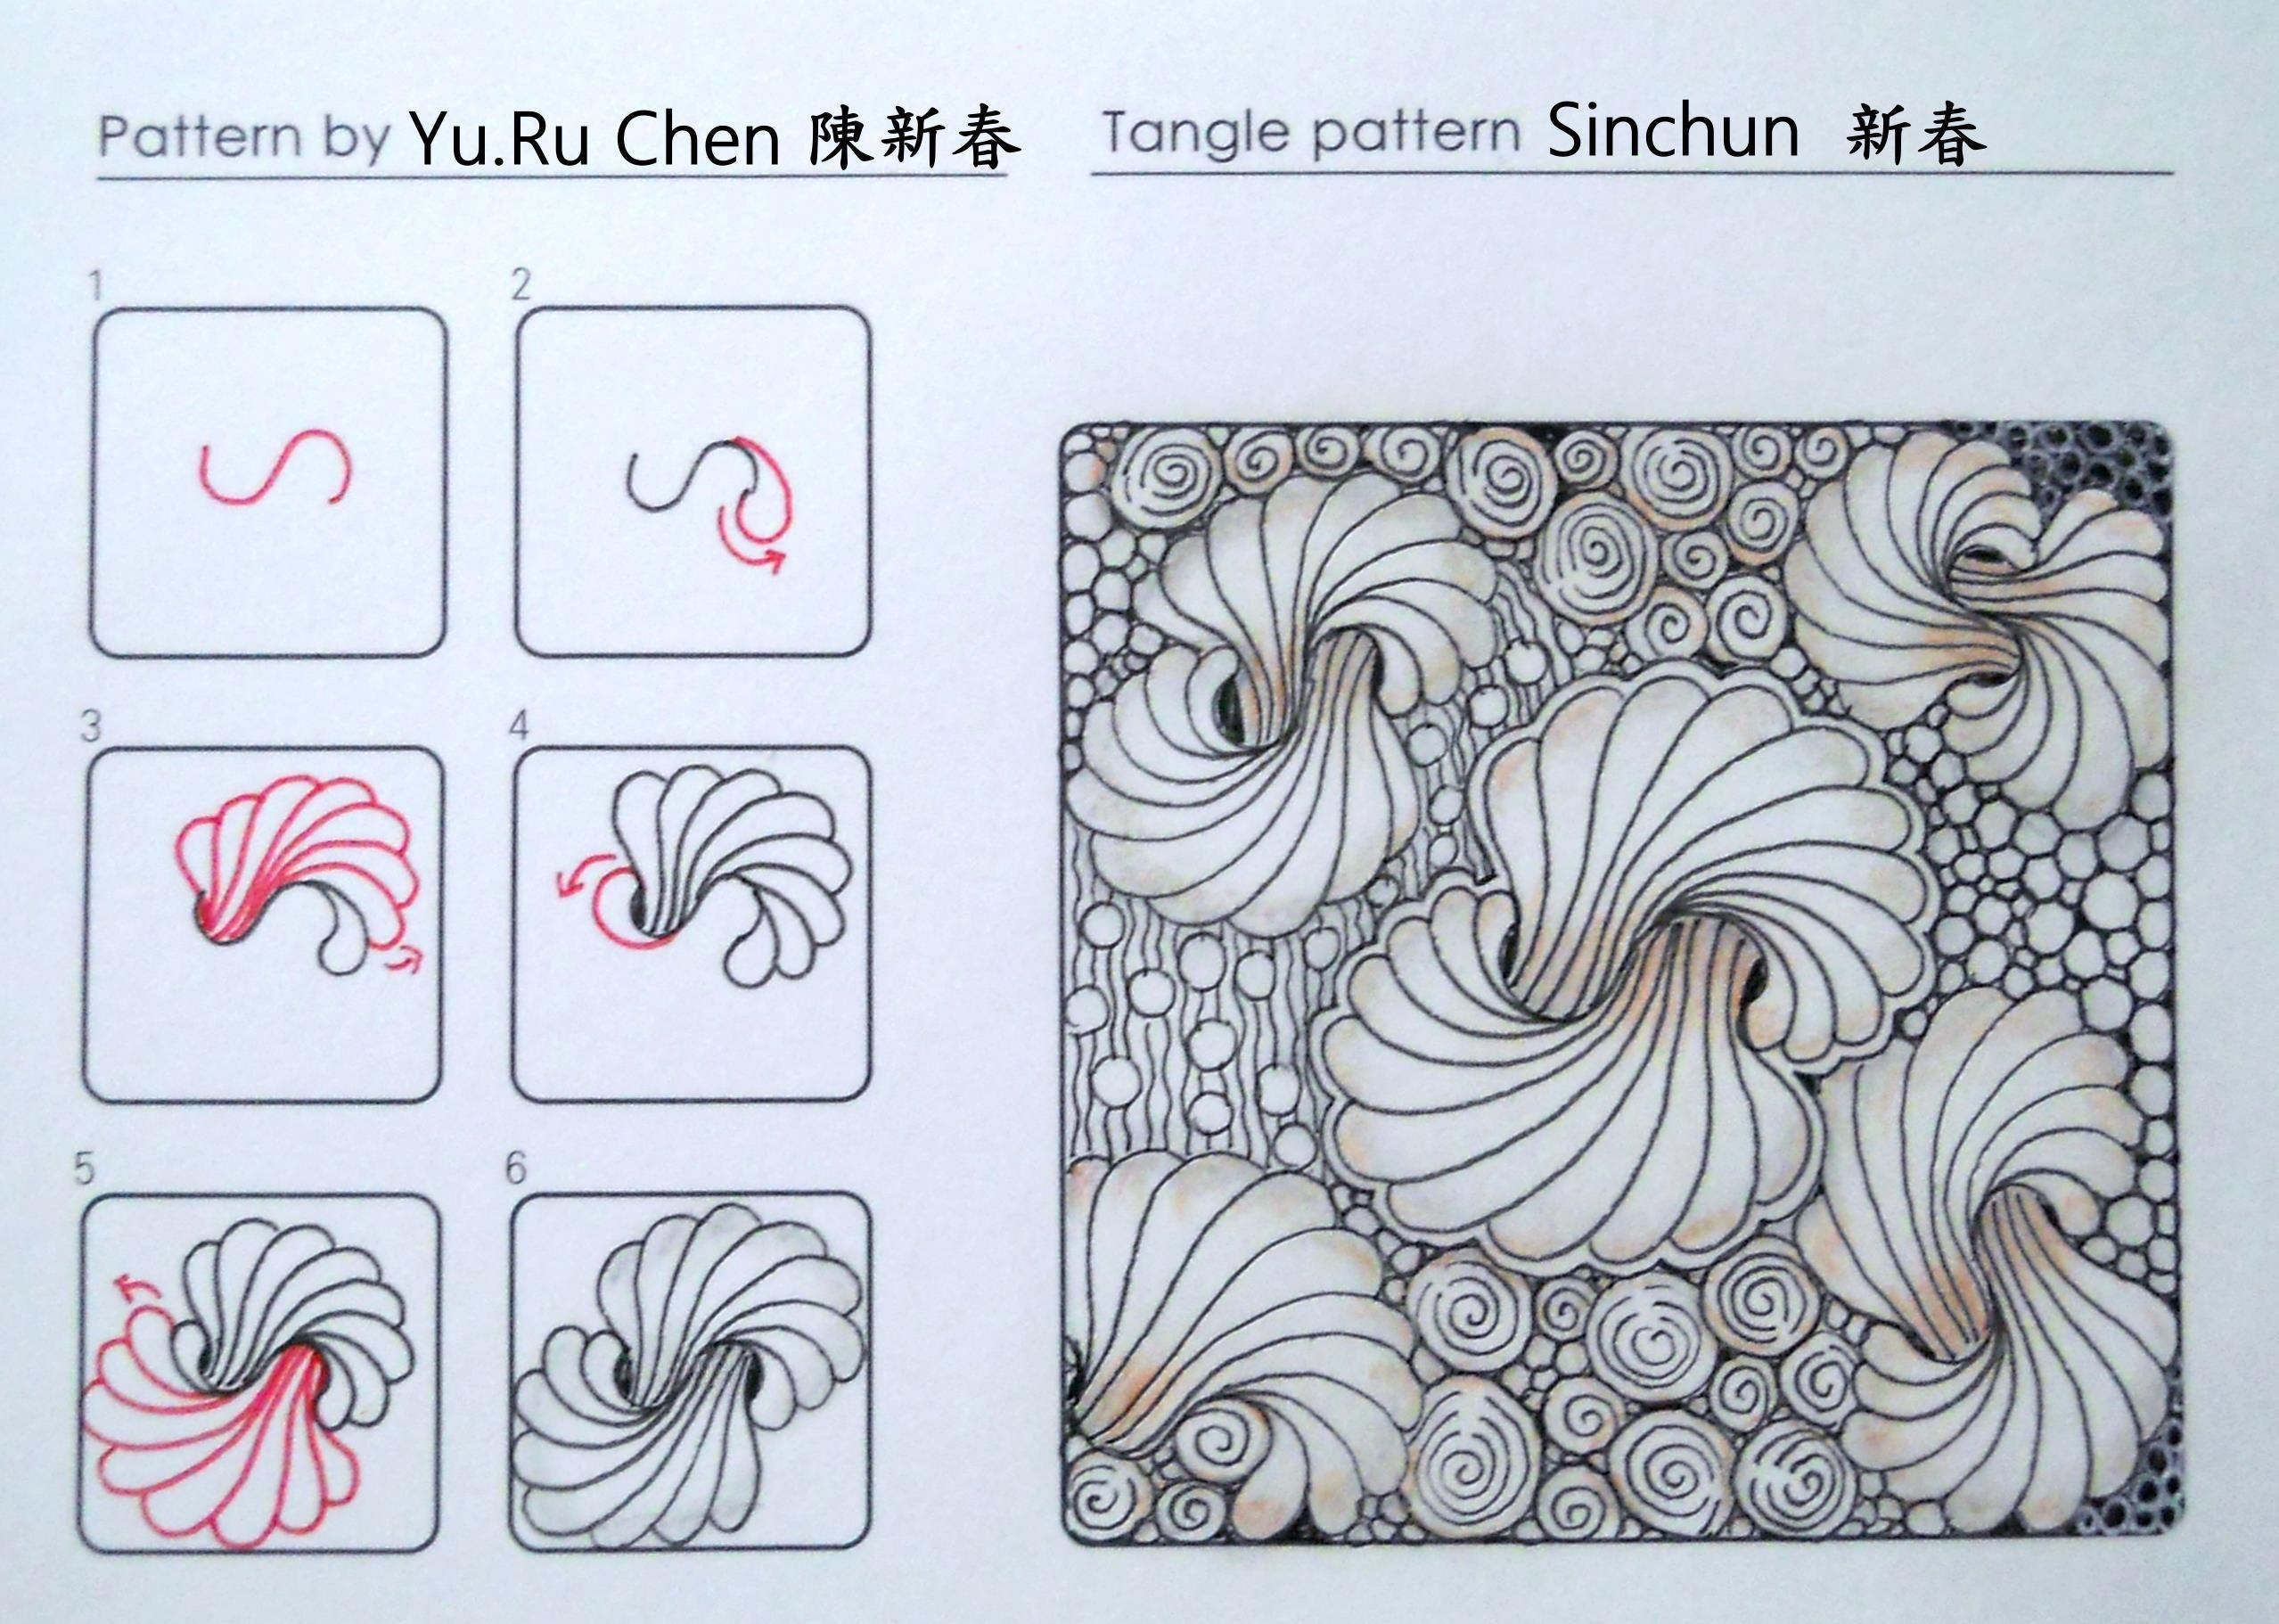 Sinchun pattern zentangle tutorials pinterest for Doodle tutorial